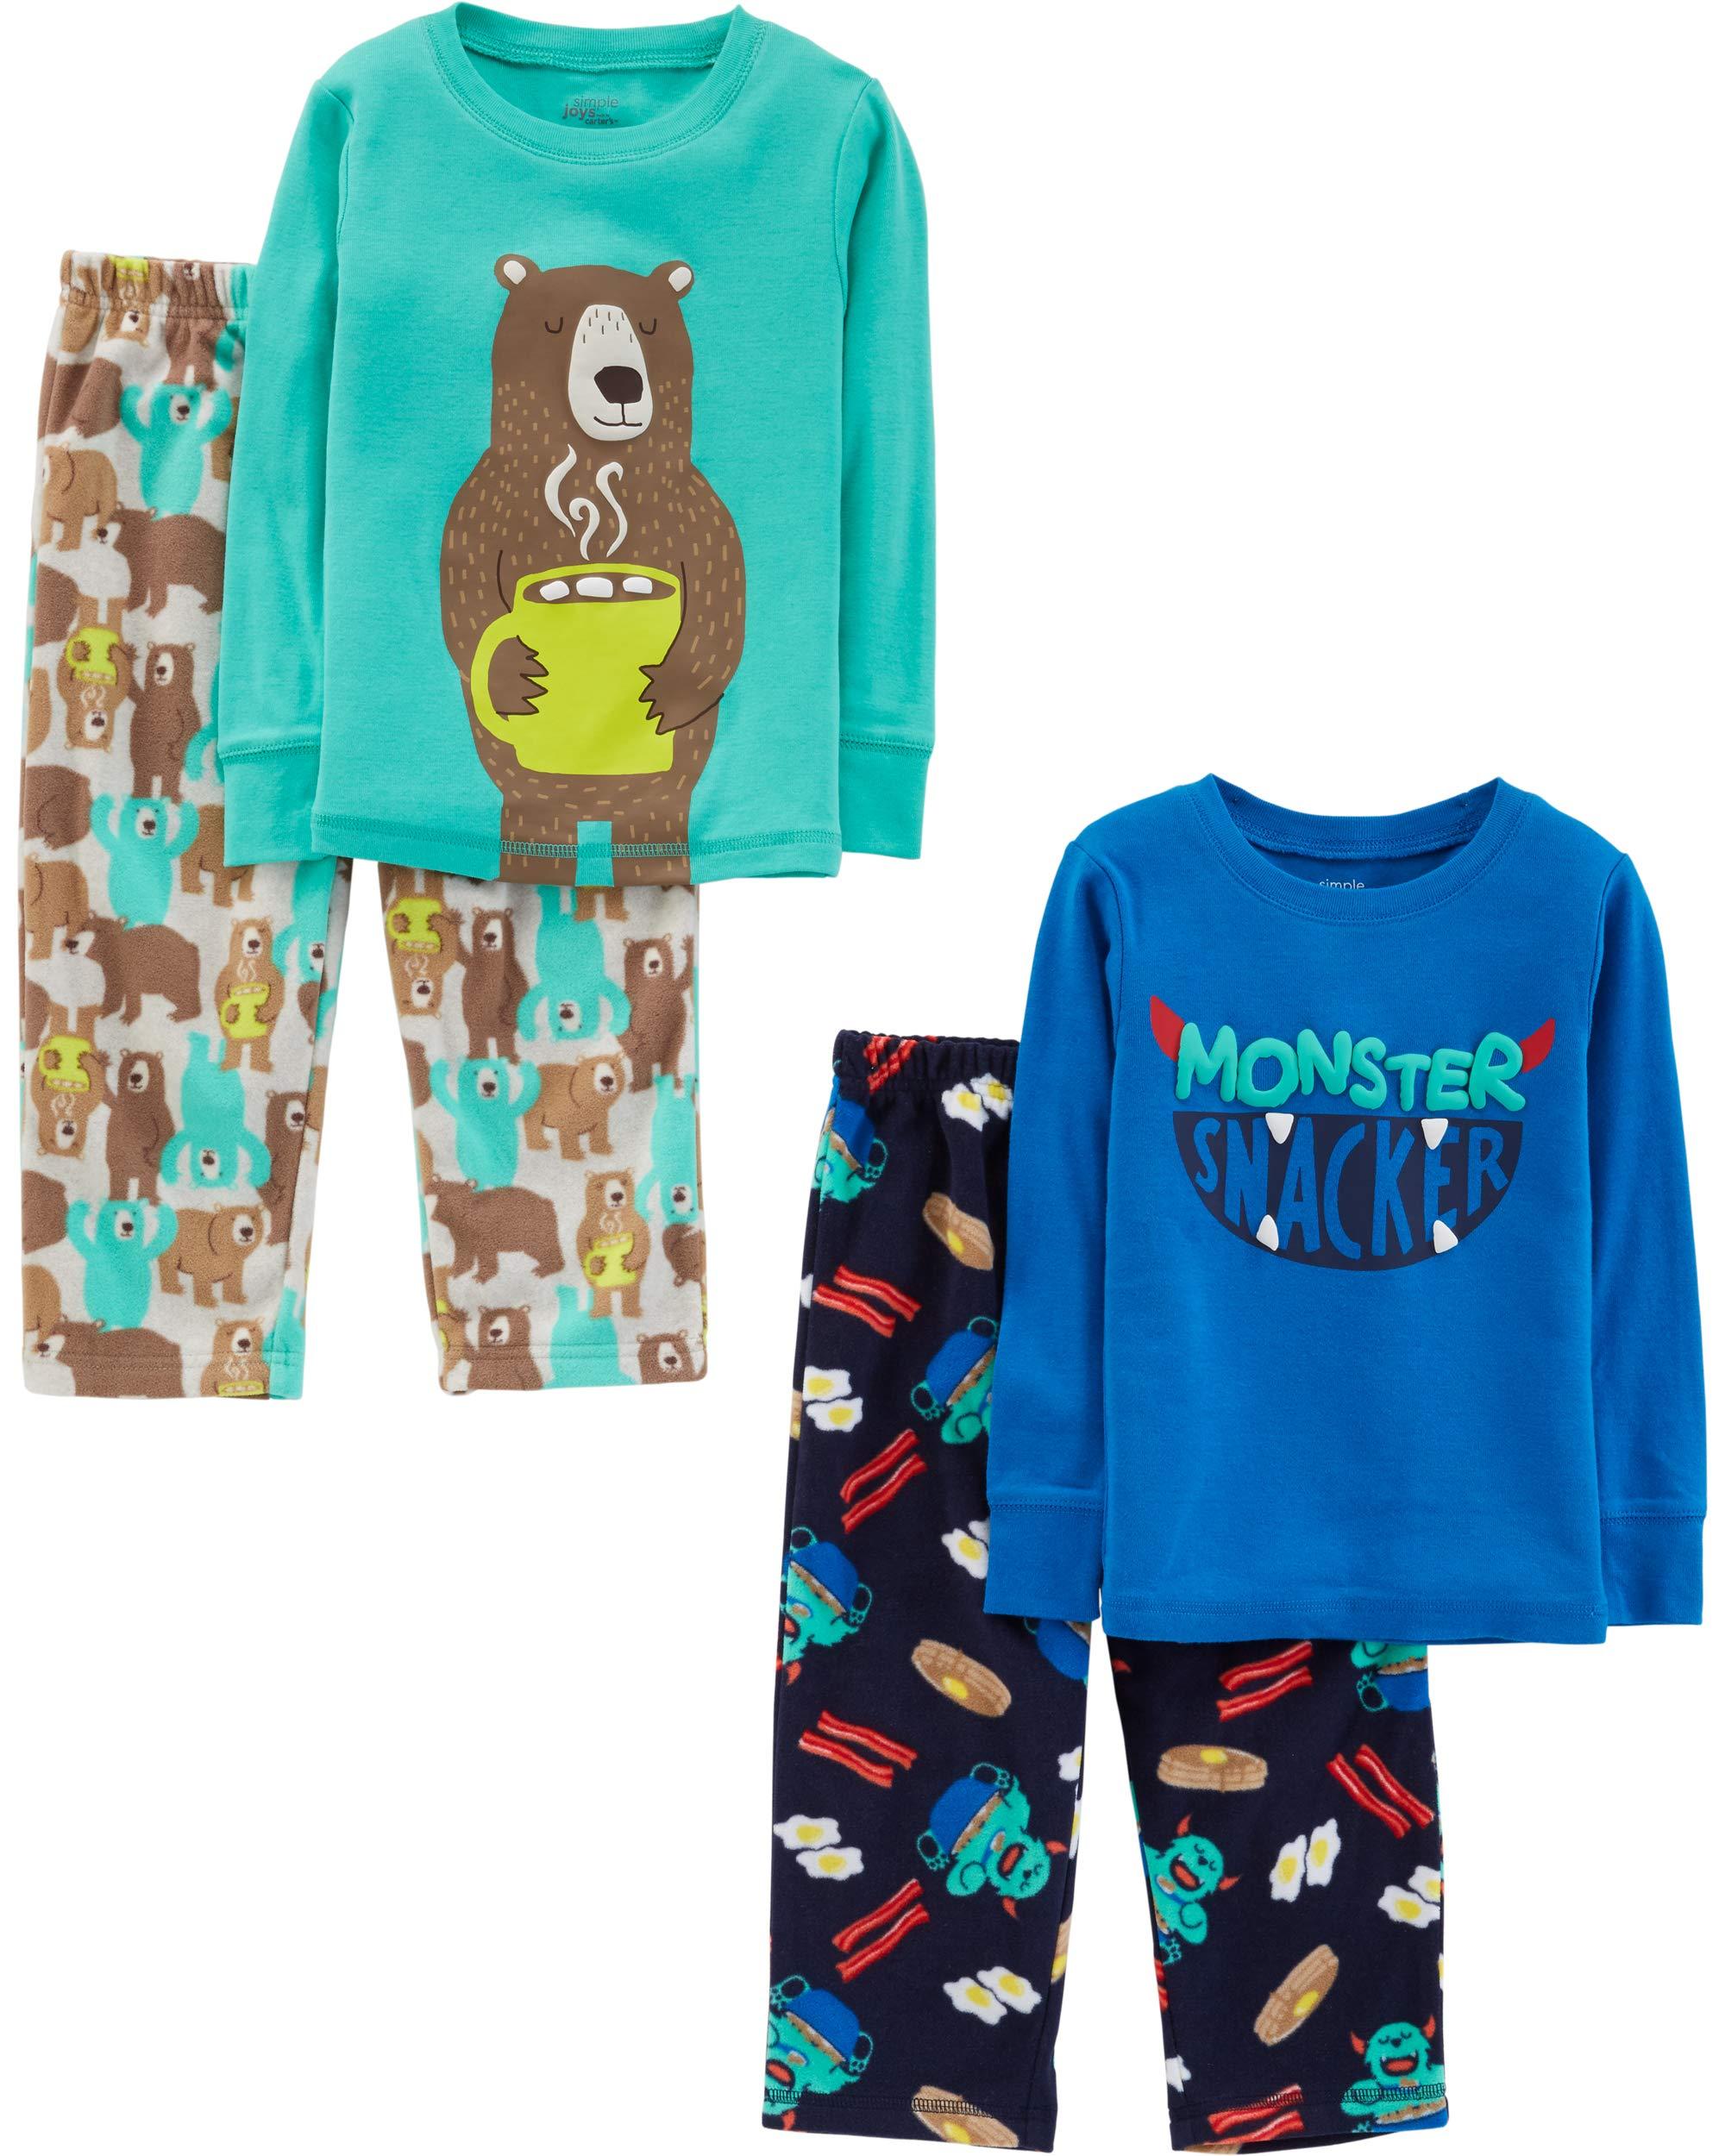 Simple Joys by Carter's Boys' Little Kid 4-Piece Pajama Set, Monster/Bear 7